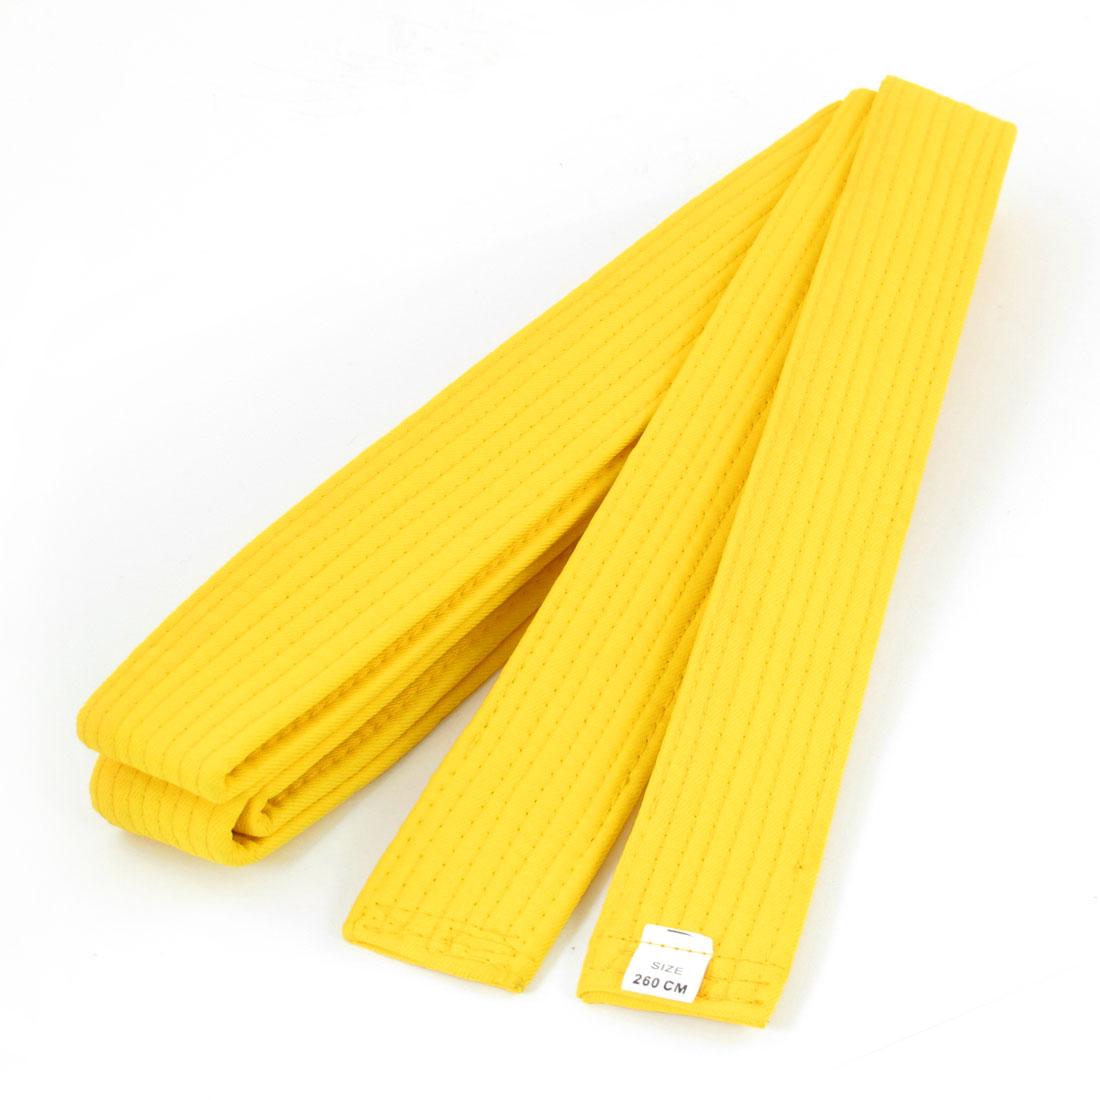 Karate TaeKwonDo Judo Yellow Flexible Belt 255cm Long